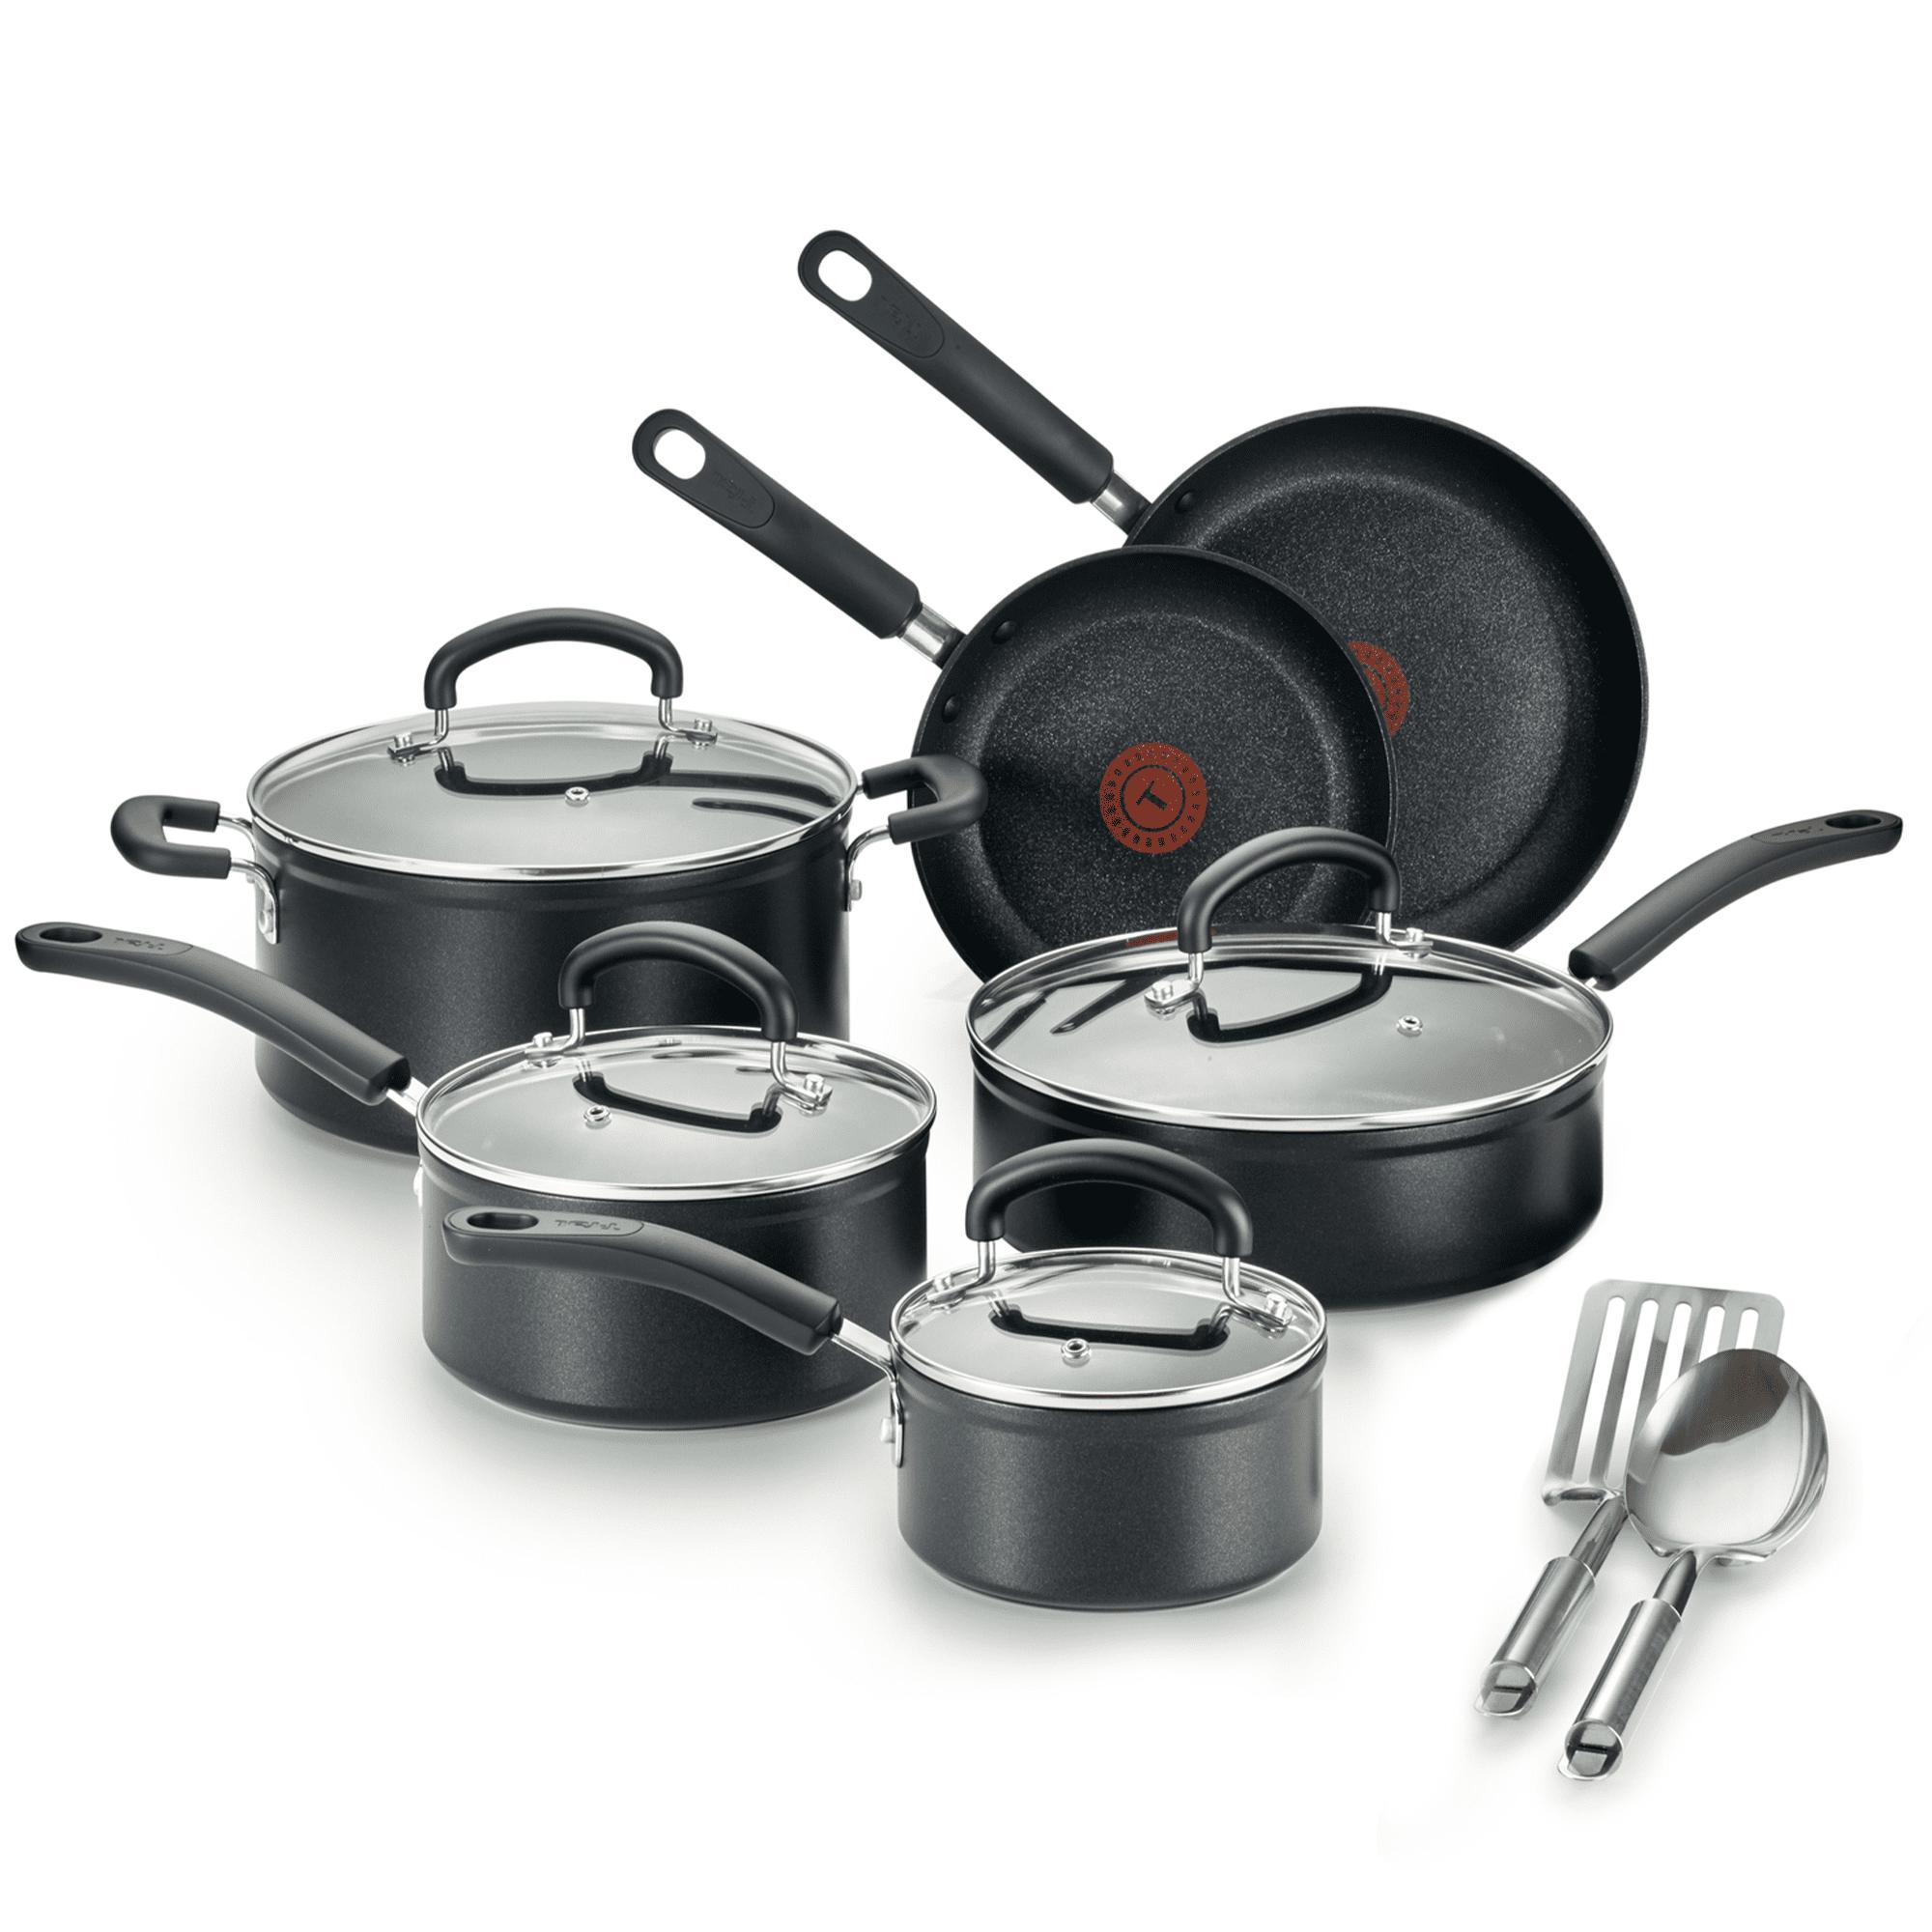 T Fal Excellence 12 Piece Titanium Nonstick Cookware Set Black Walmart Com Walmart Com